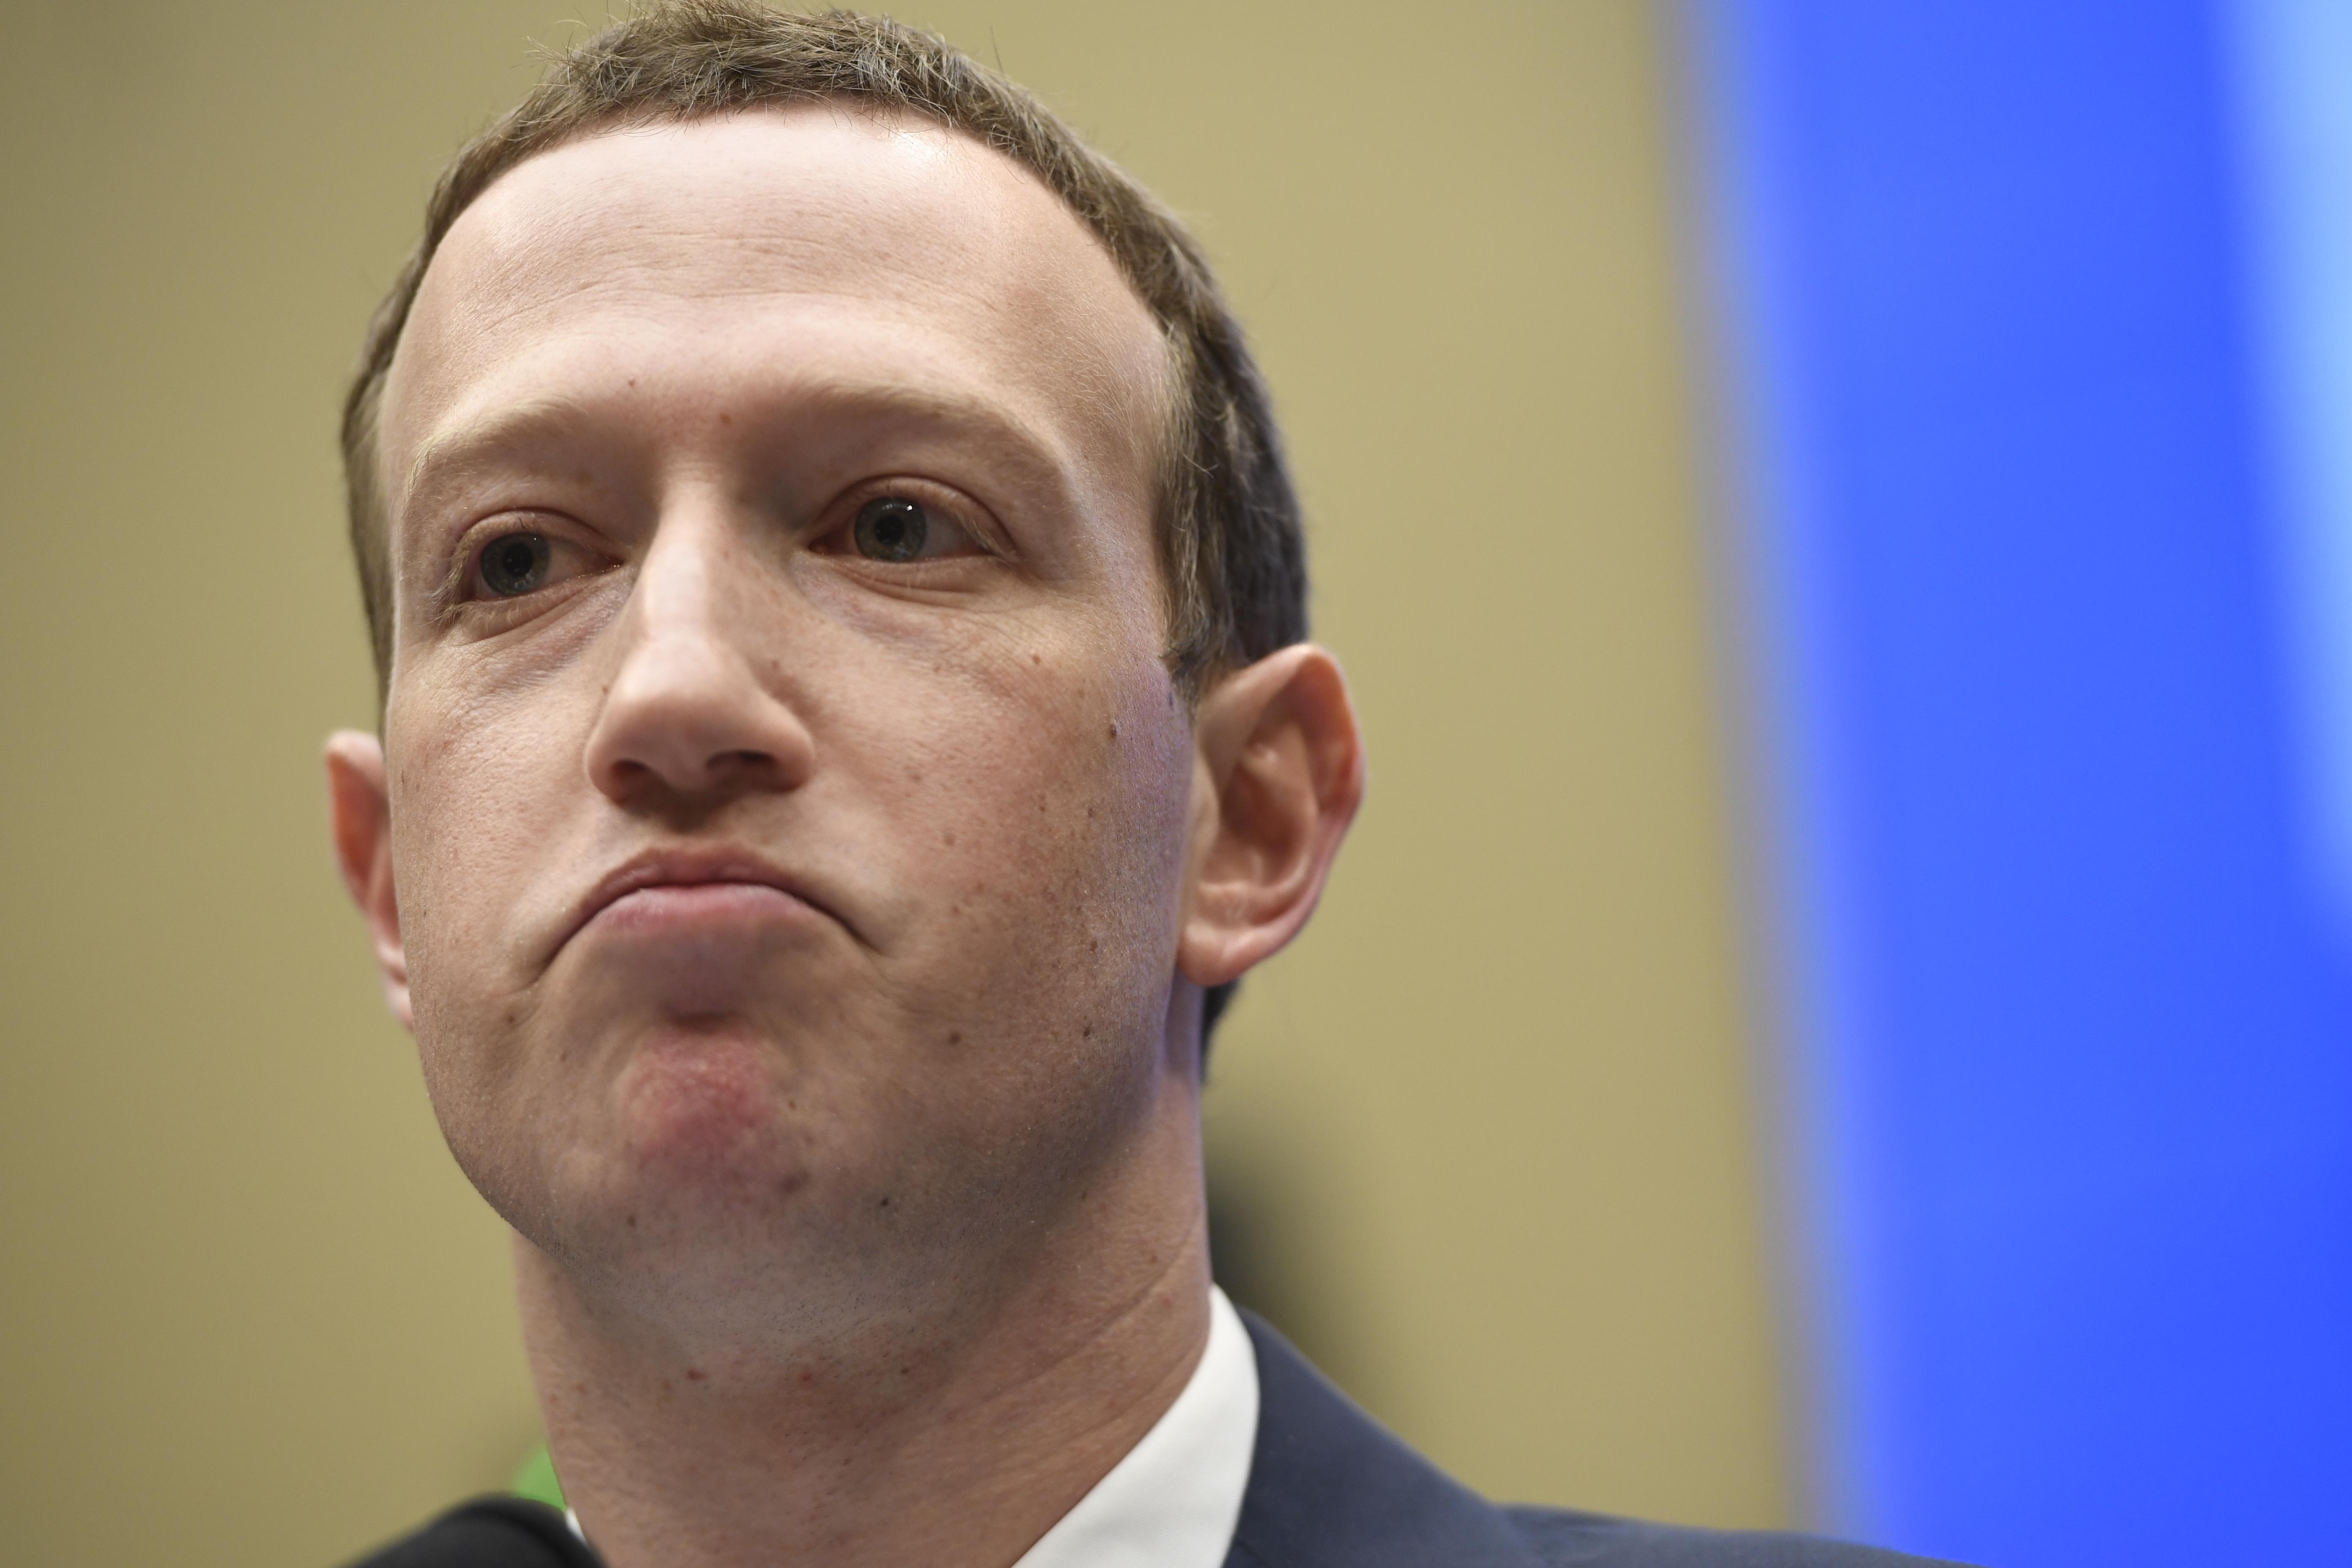 Mark Zuckerberg a világ harmadik leggazdagabb embere